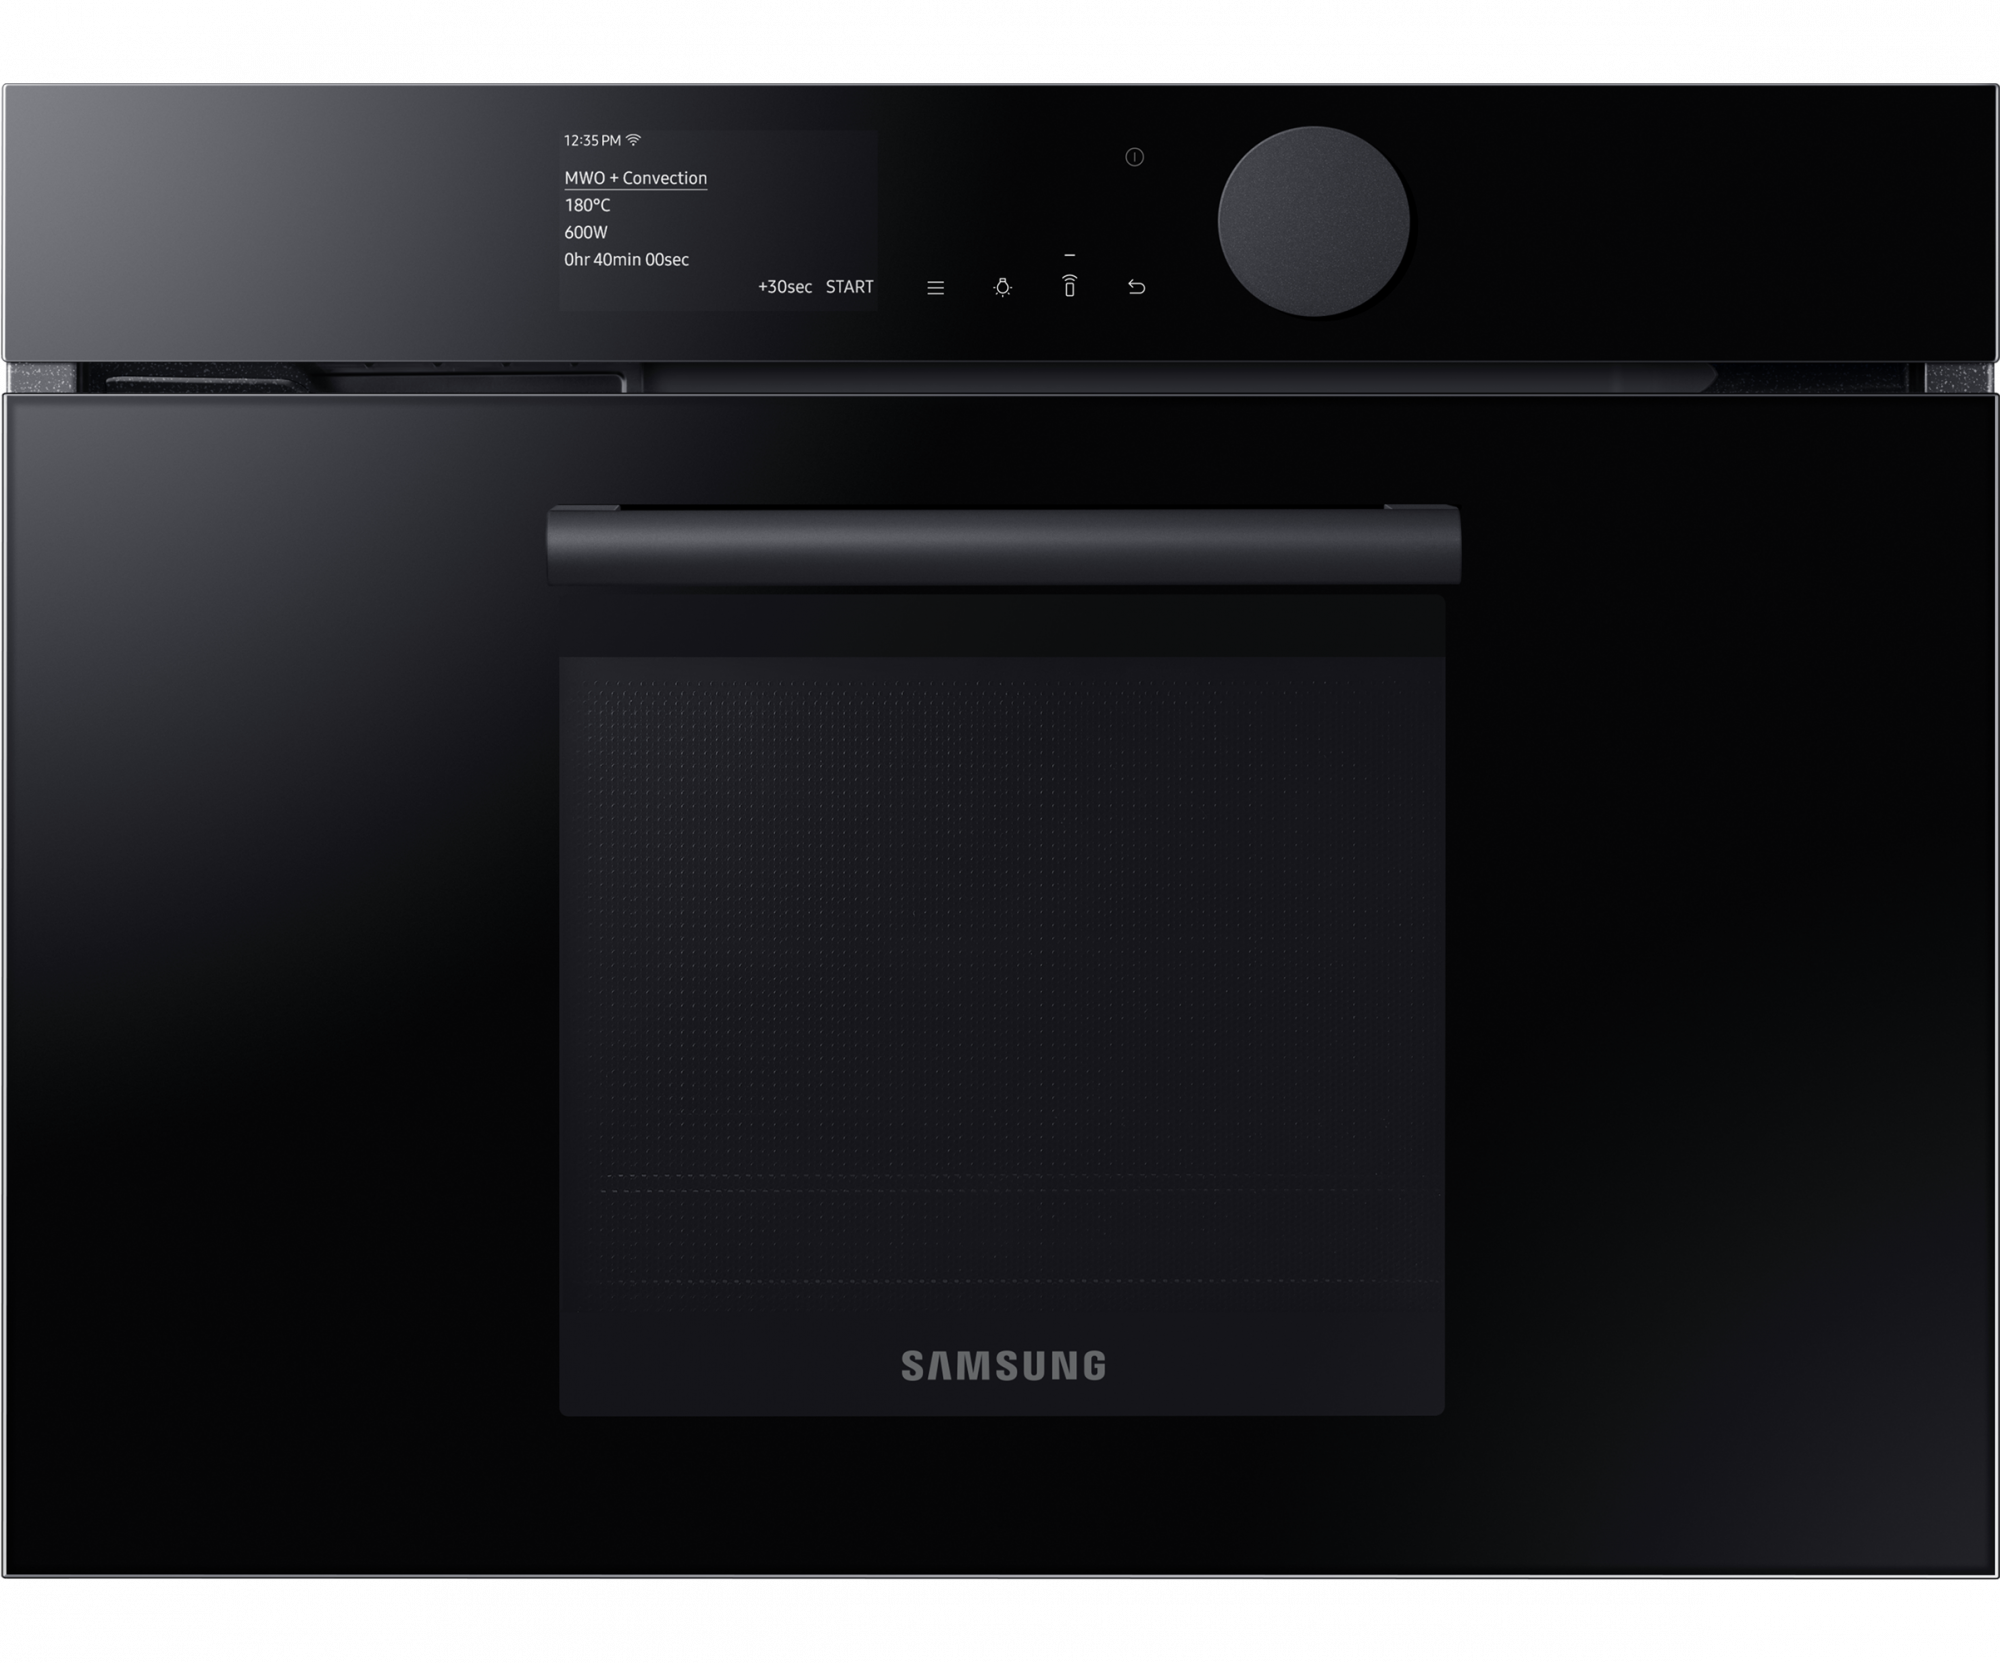 Samsung Infinite Compact Oven - Nq50T8539Bk/Eu Block Onyx